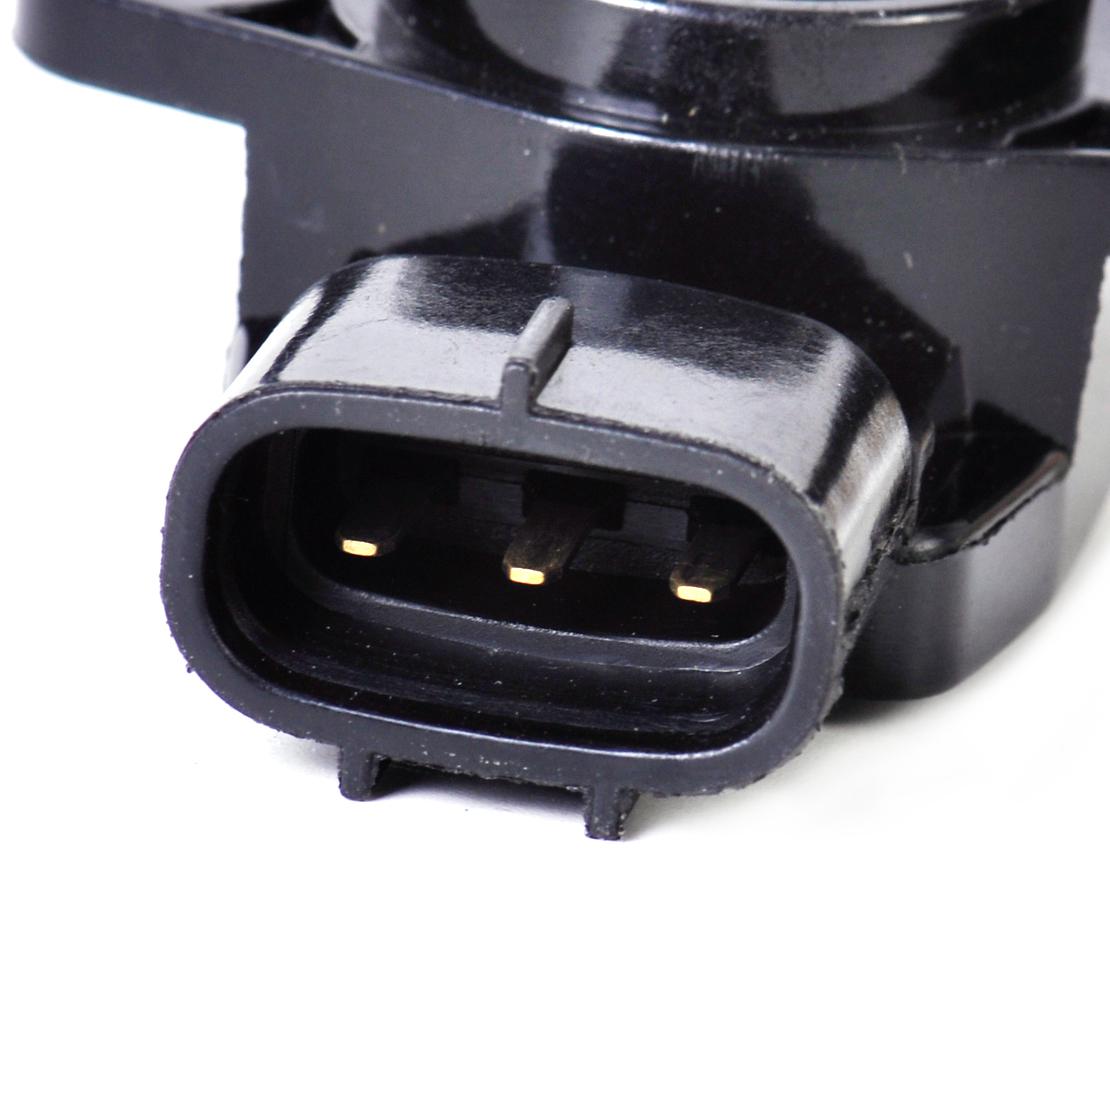 Throttle Position Sensor Price South Africa: TPS Engine Throttle Position Sensor 1342065D00 91175256